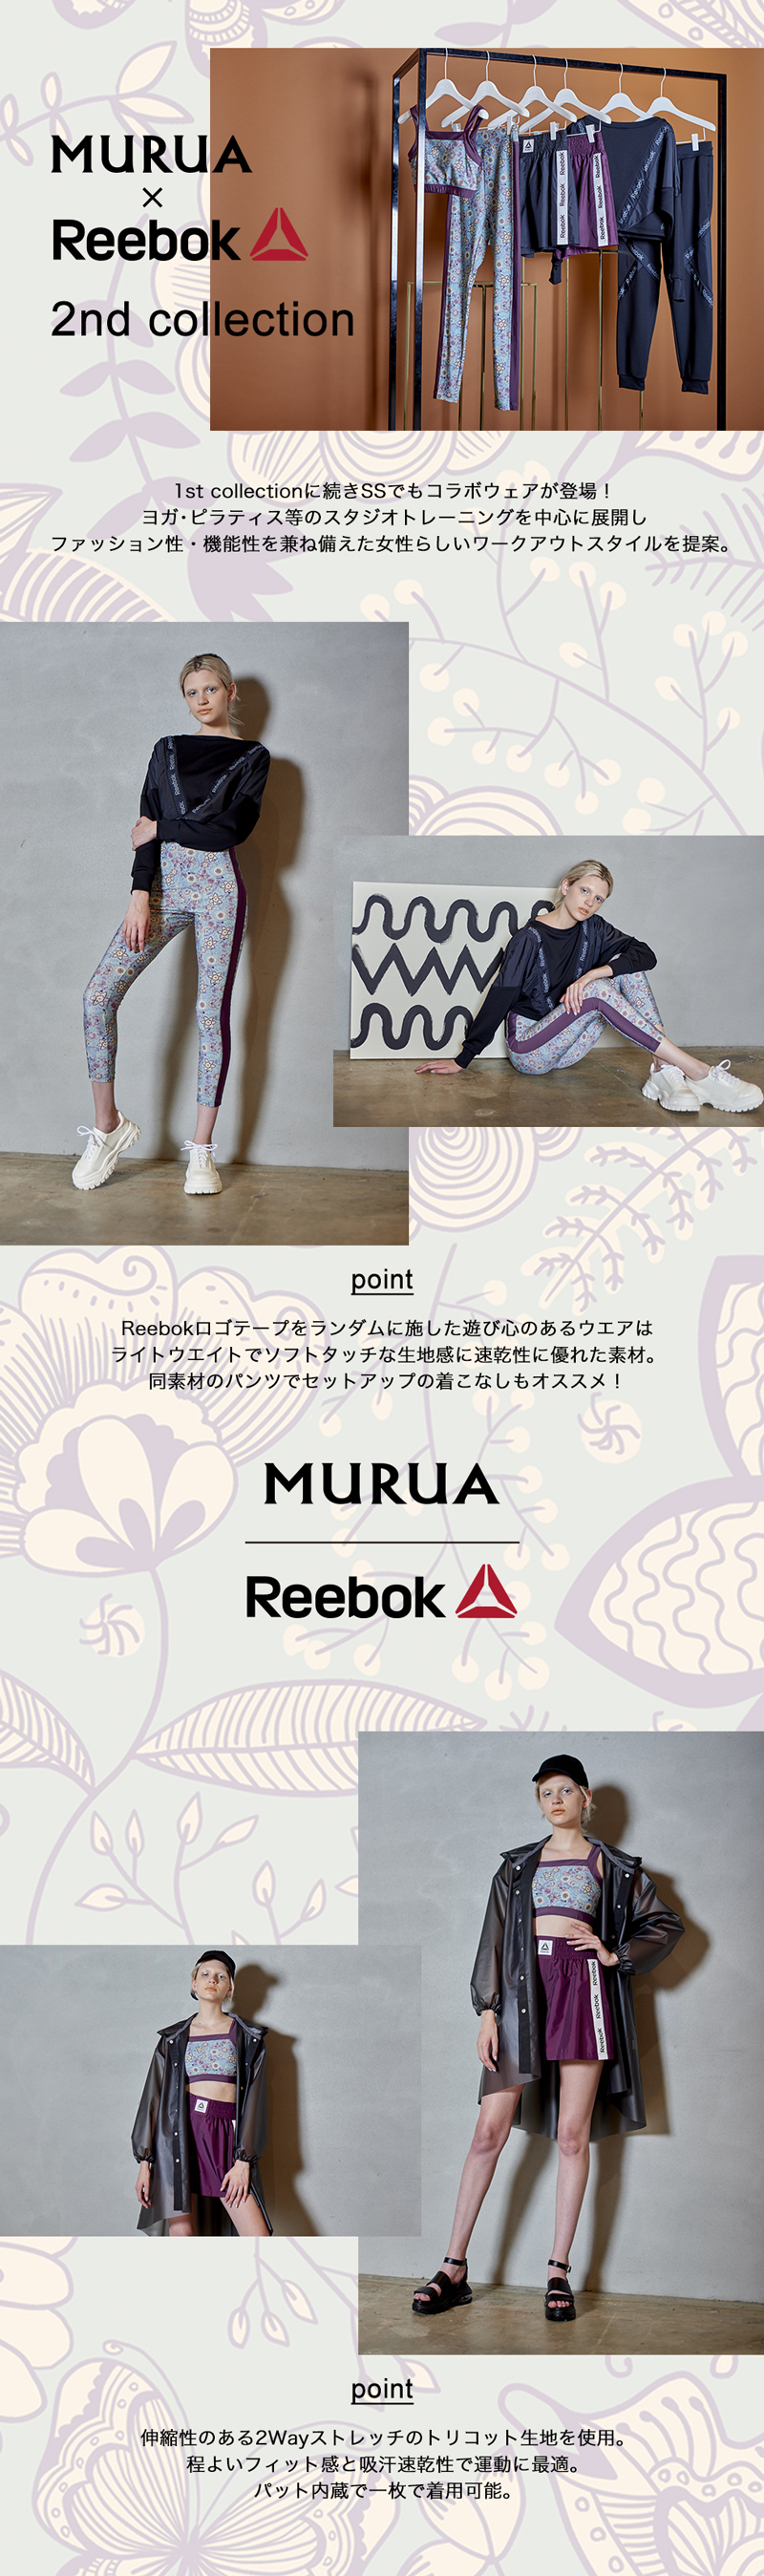 MURUA_SP_0123_Reebok